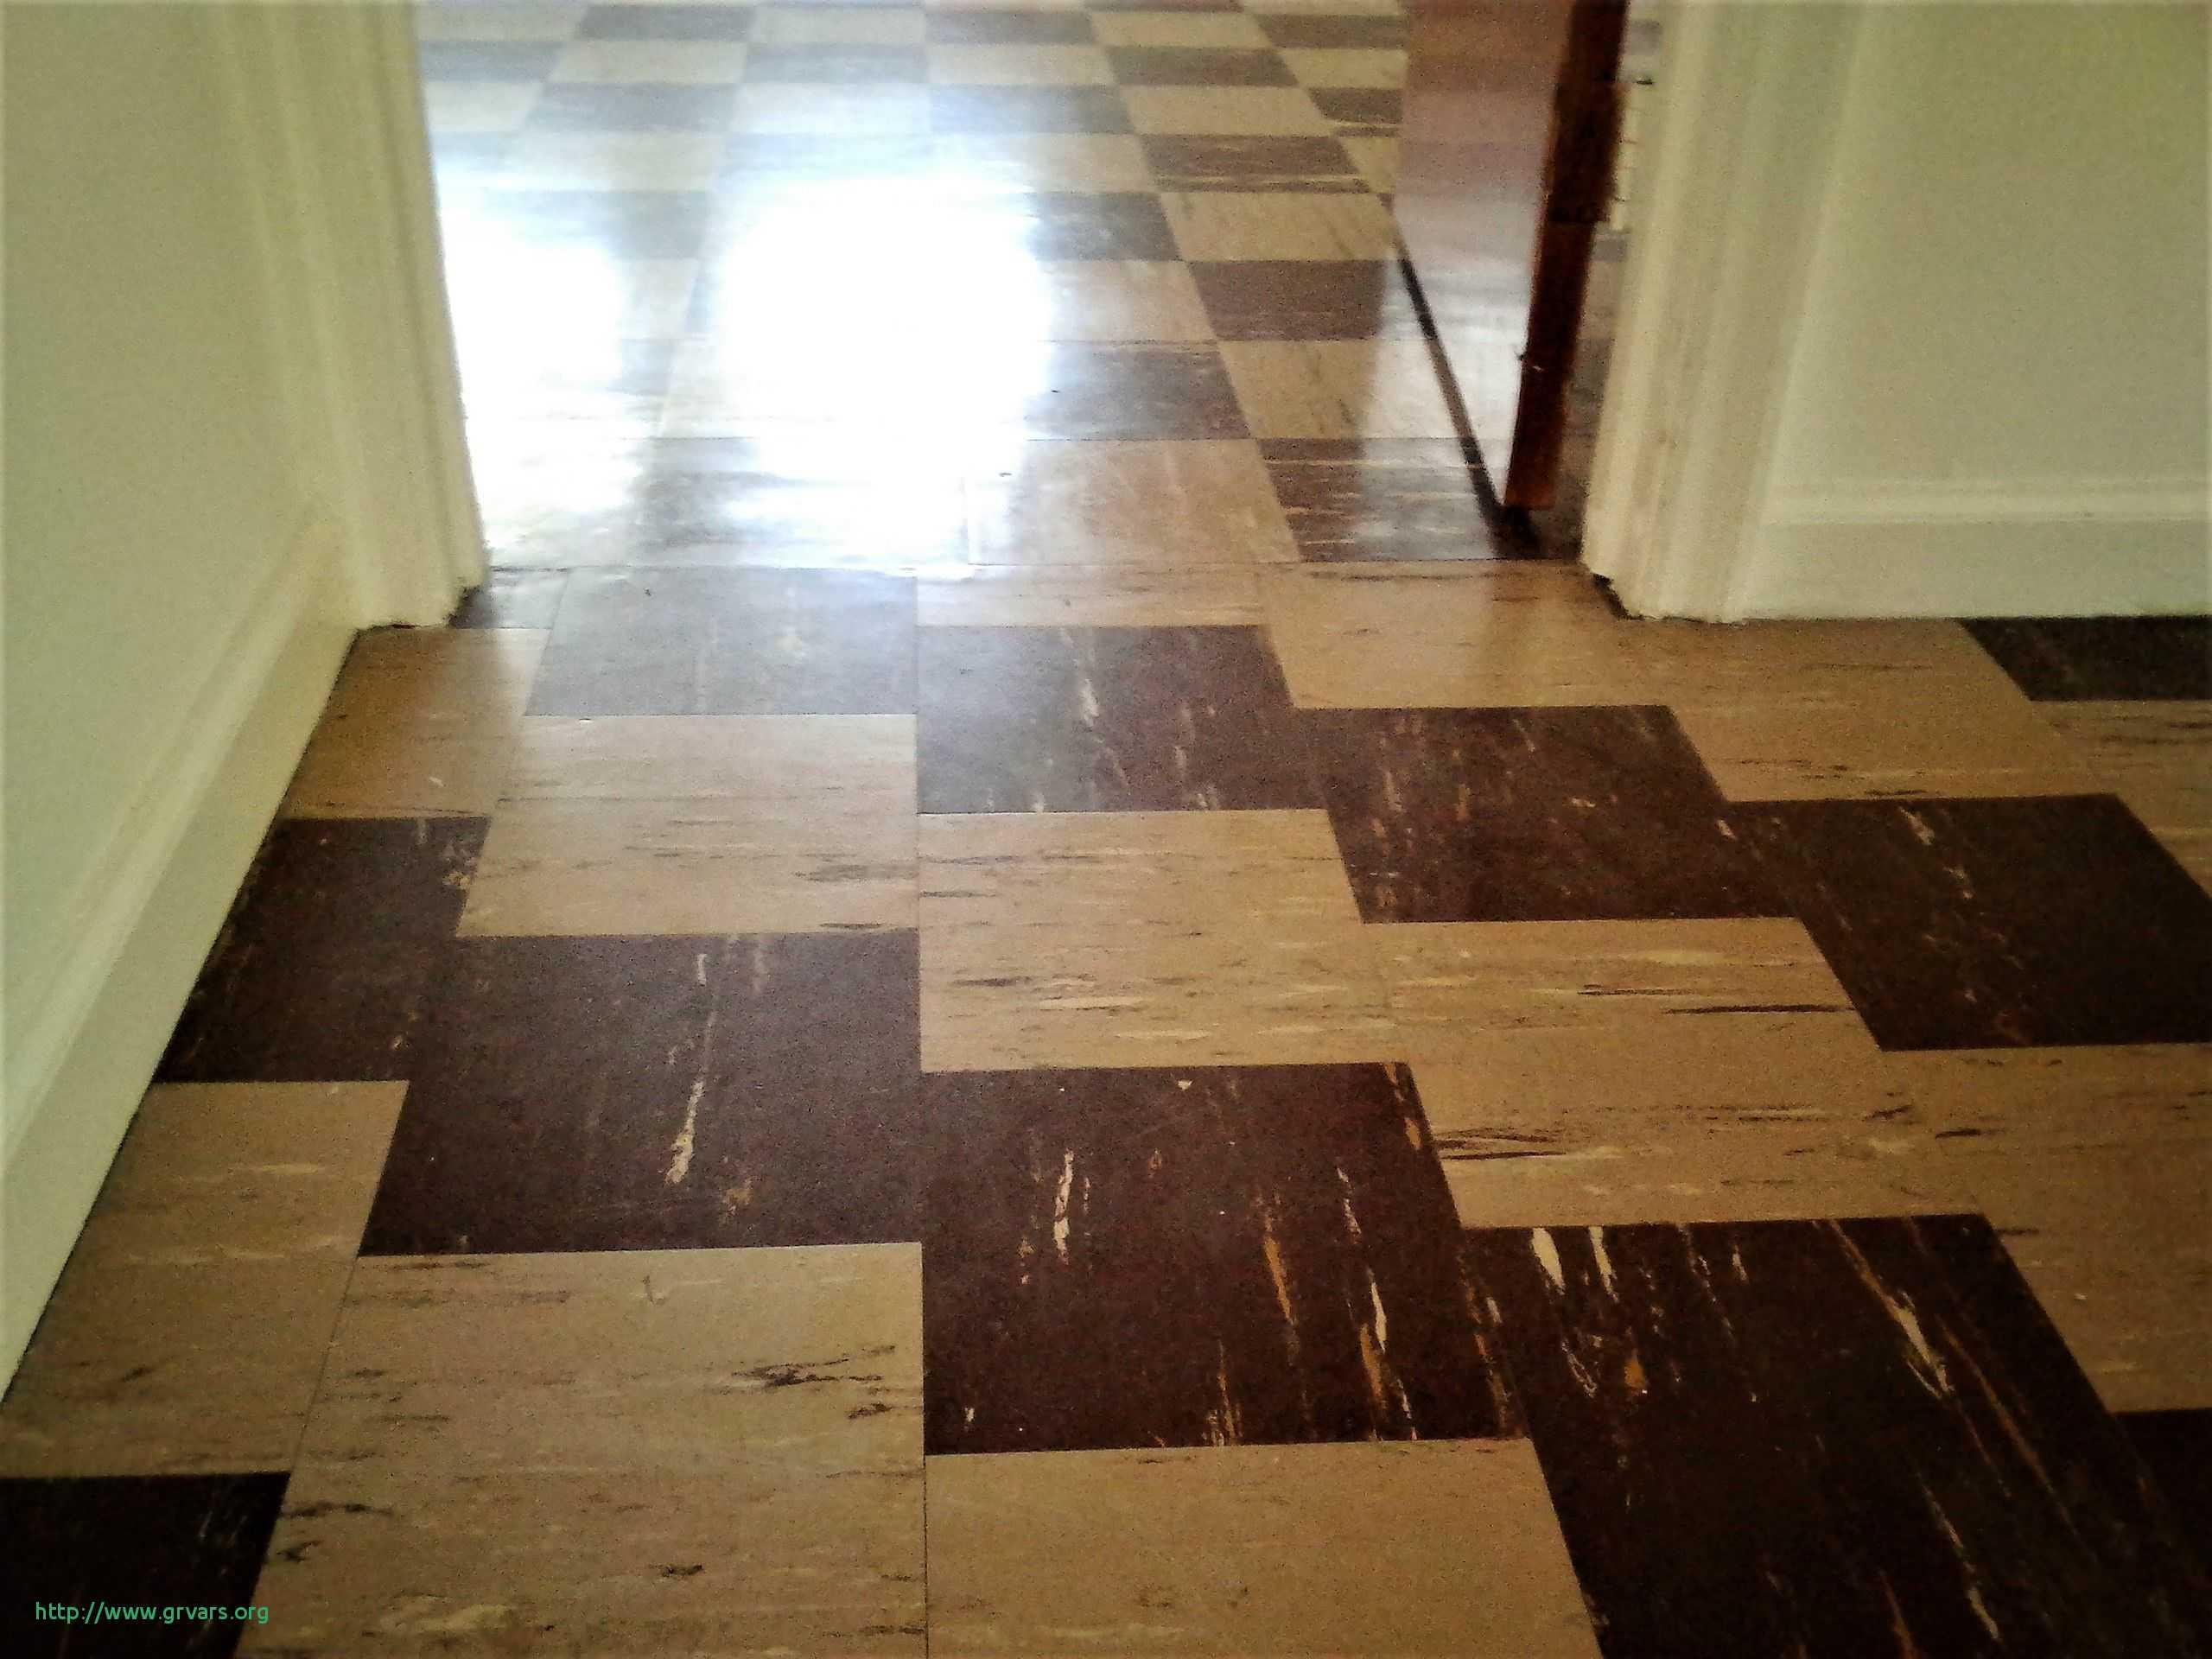 hardwood floors wilmington de of 19 a‰lagant flooring jobs edmonton ideas blog pertaining to old vinyl asbestos tile flooring